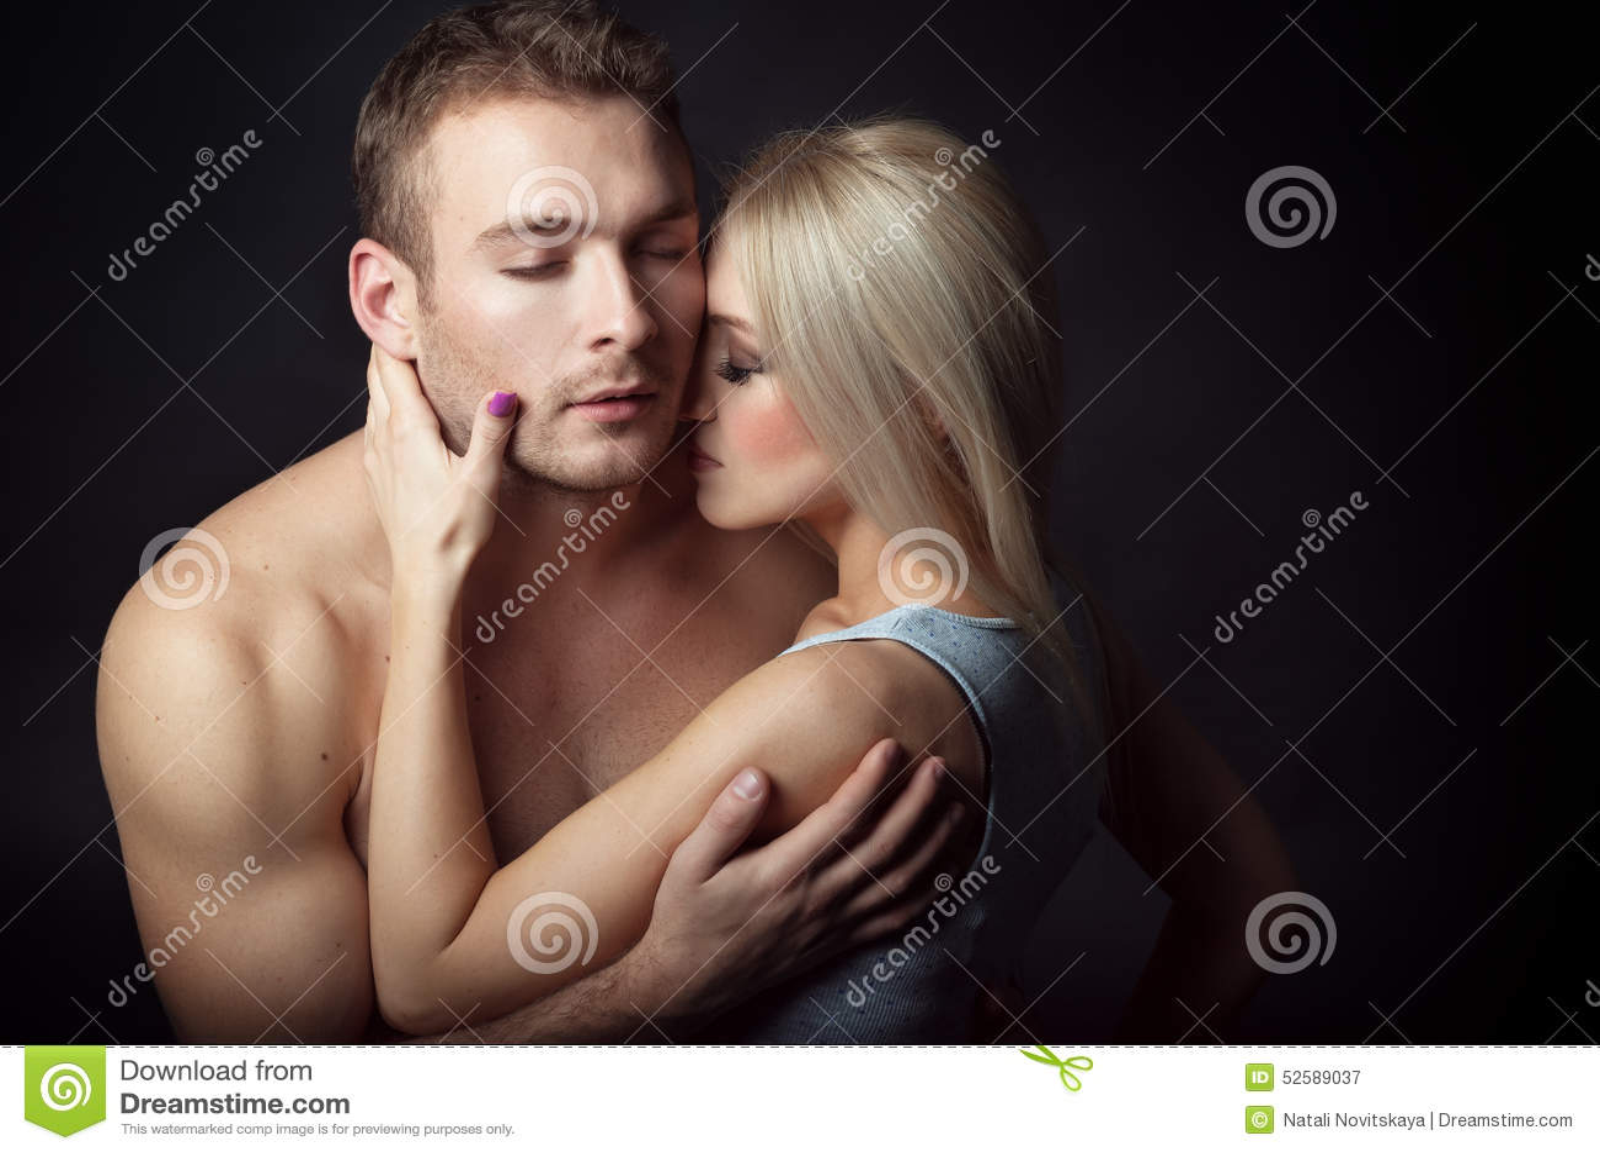 Arschfick! Every naked men always